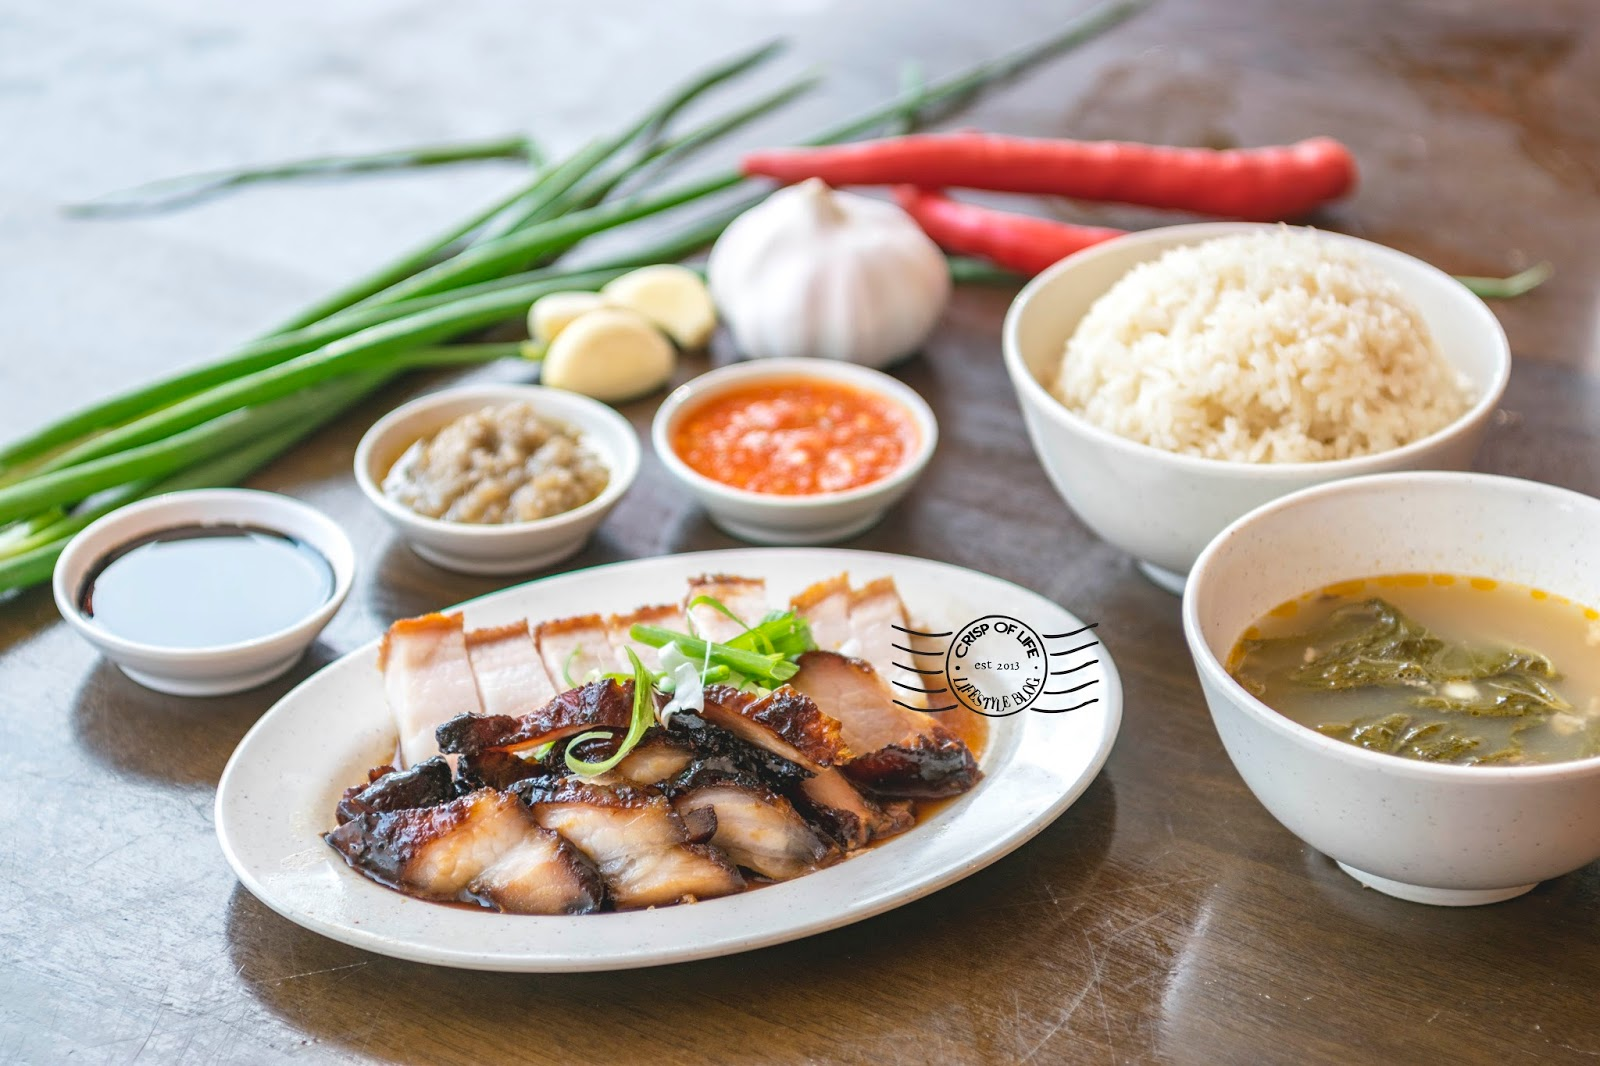 Azhong Kitchen Hainan Chicken Rice 亞忠海南雞飯 @ Lorong Kampung Malabar, Georgetown, Penang